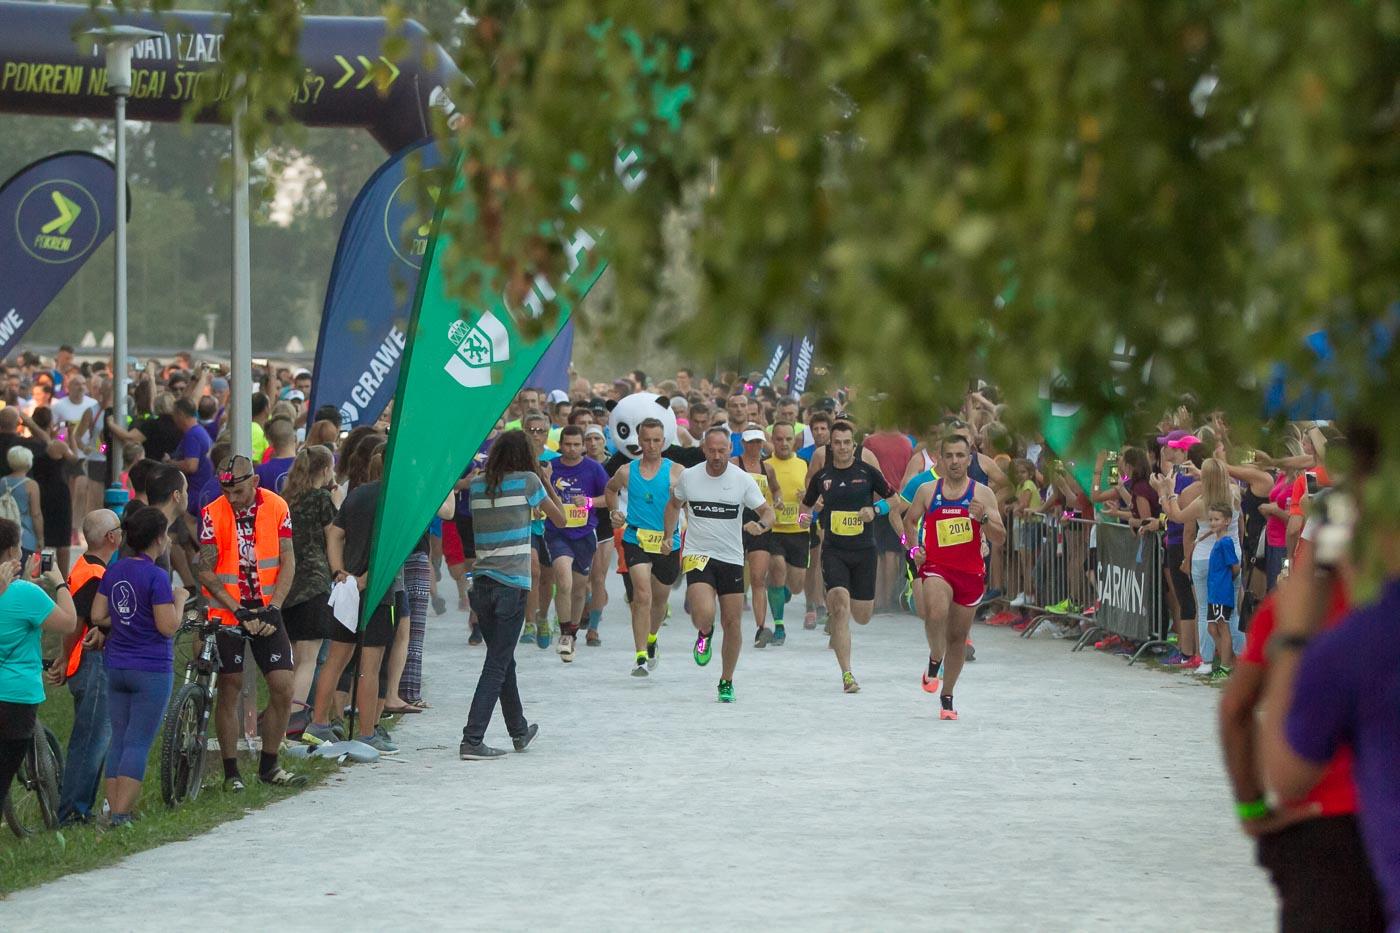 Foto: 3sporta.com